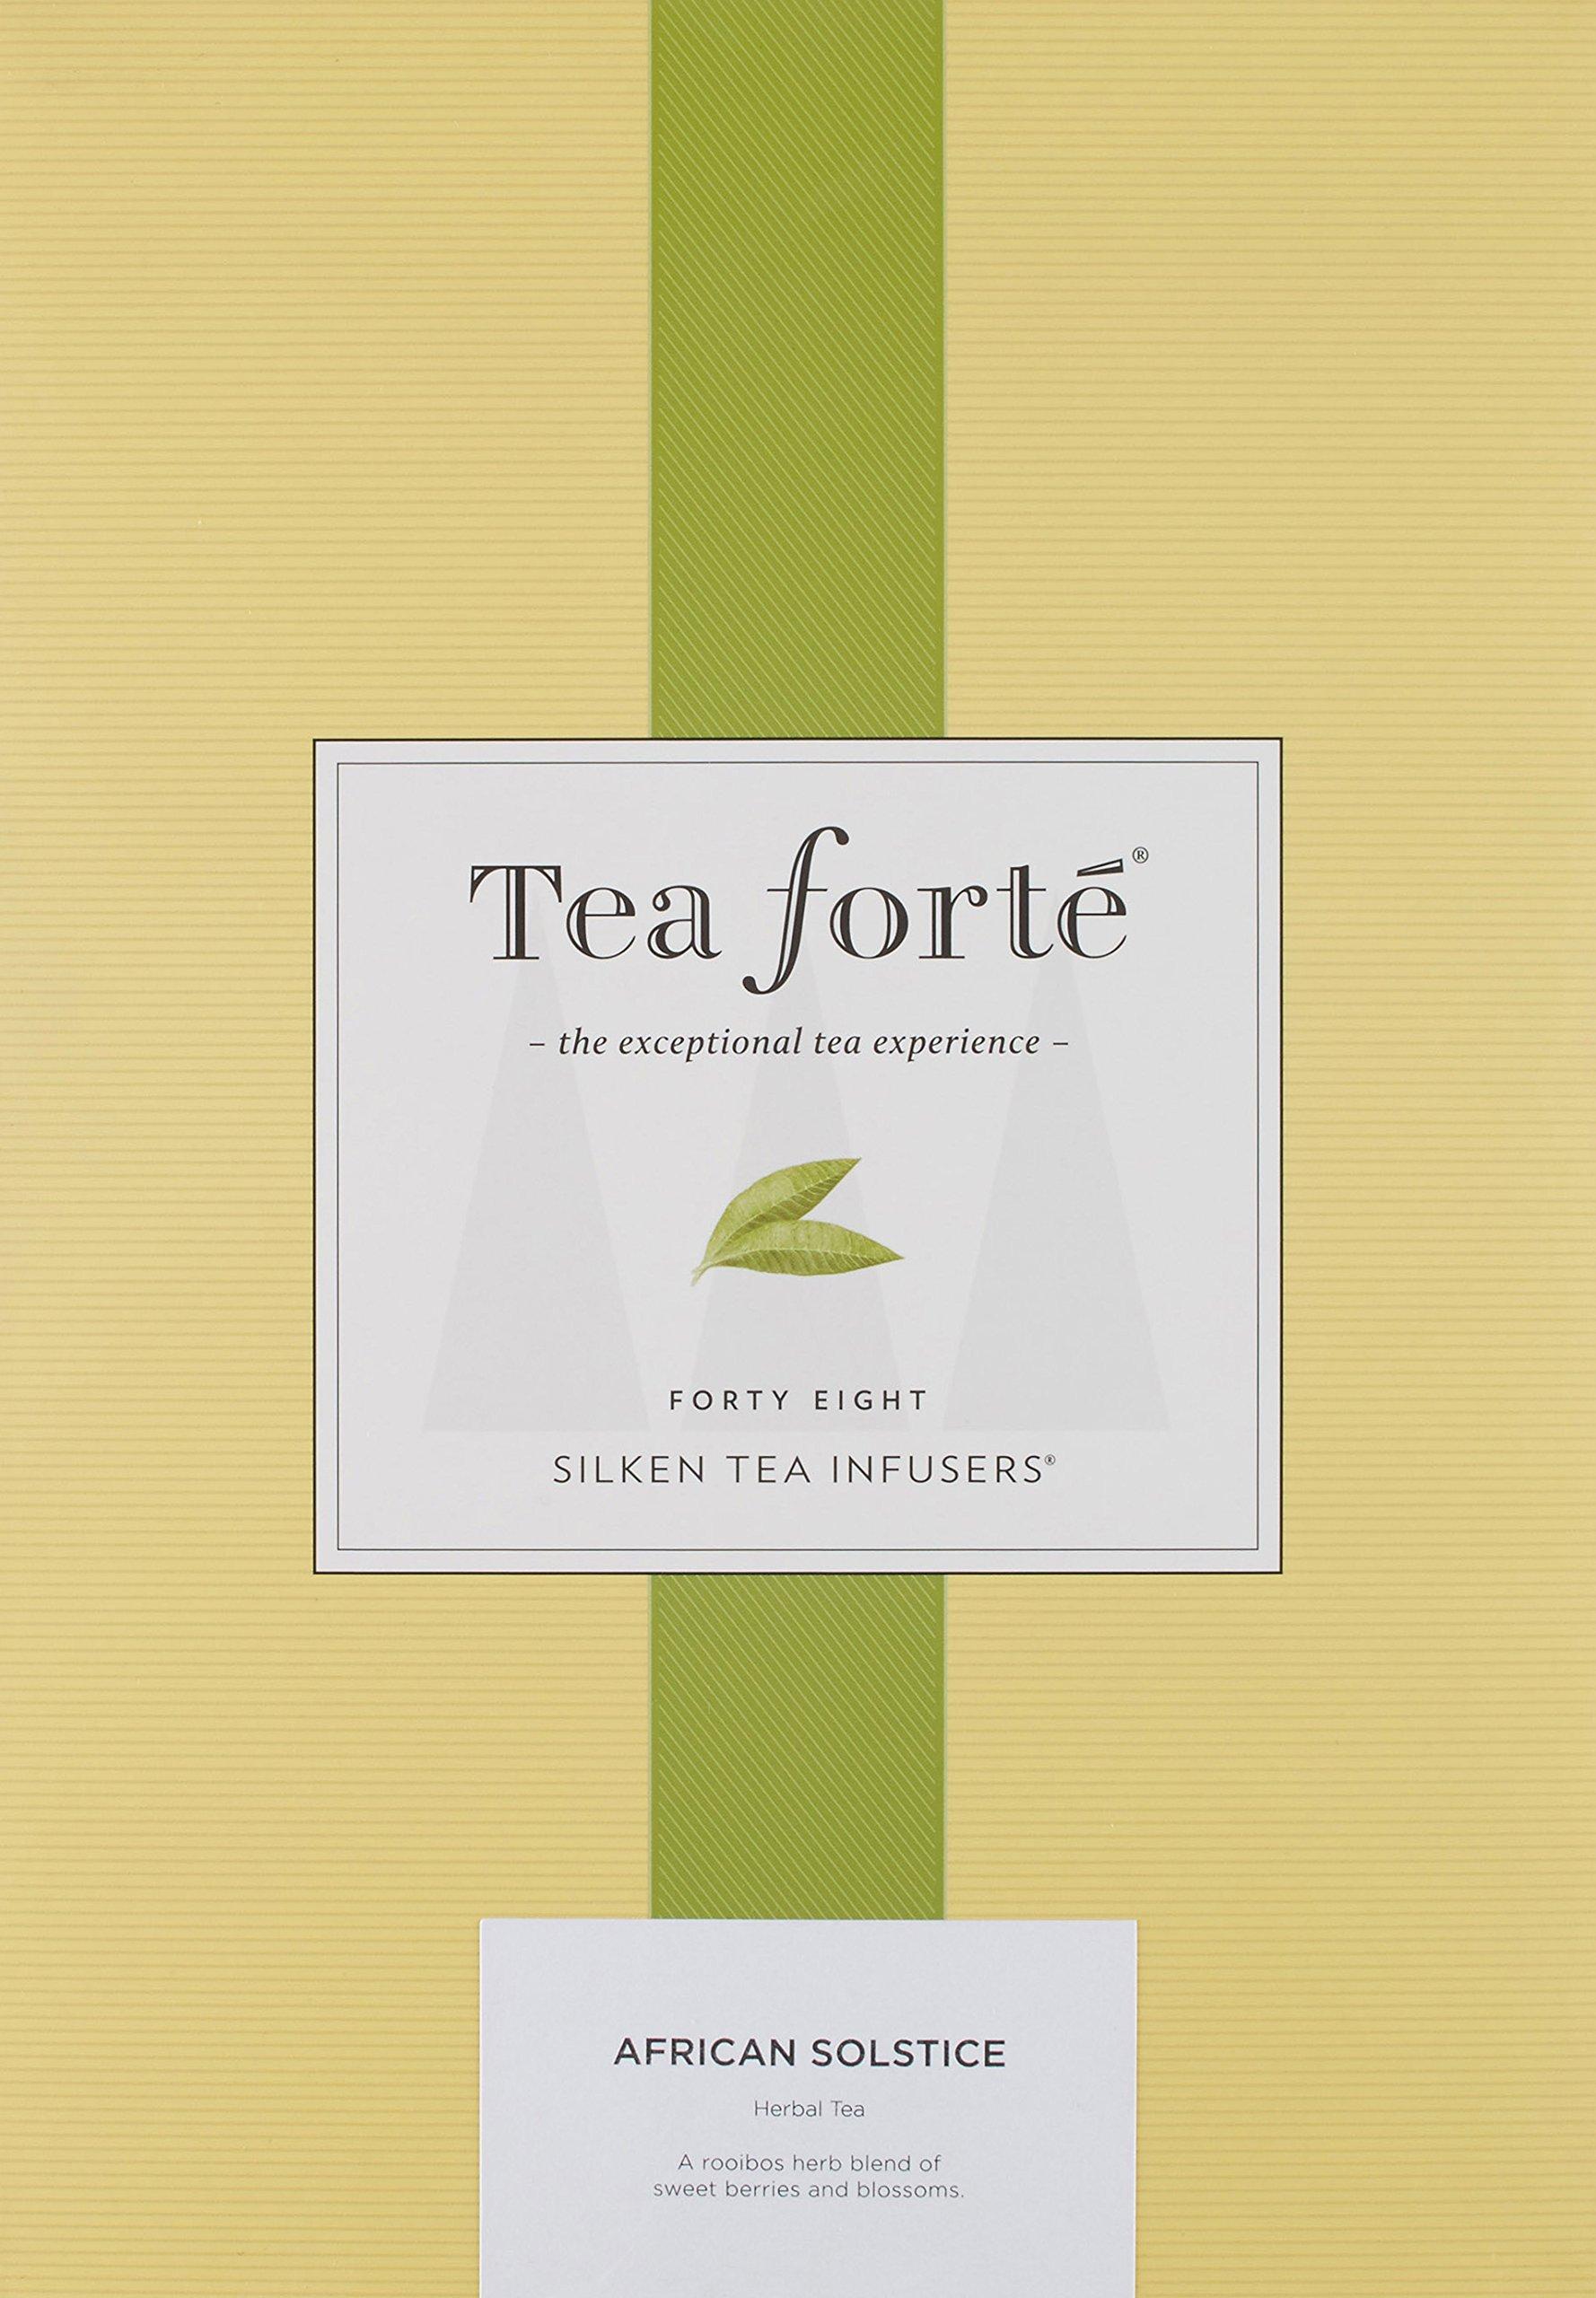 Tea-fort-African-Solstice-Event-Box-mit-48-Tee-Pyramiden-Rooibostee-1er-Pack-1-x-144-g